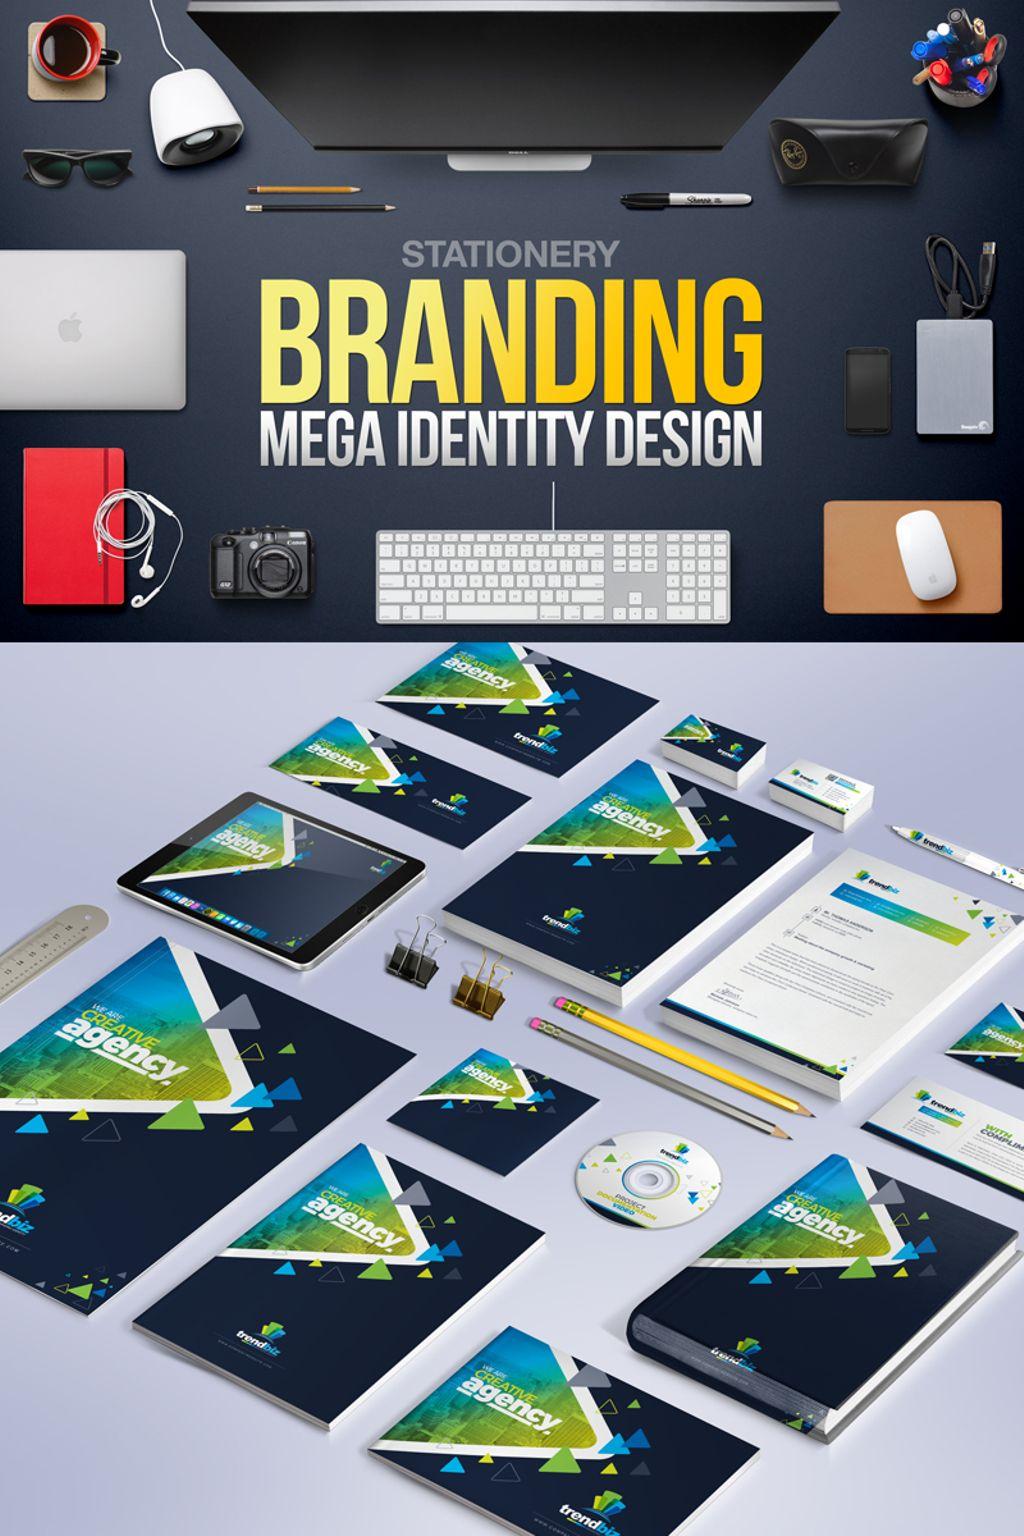 Stationery Branding Mega Identity Design Corporate Identity Template